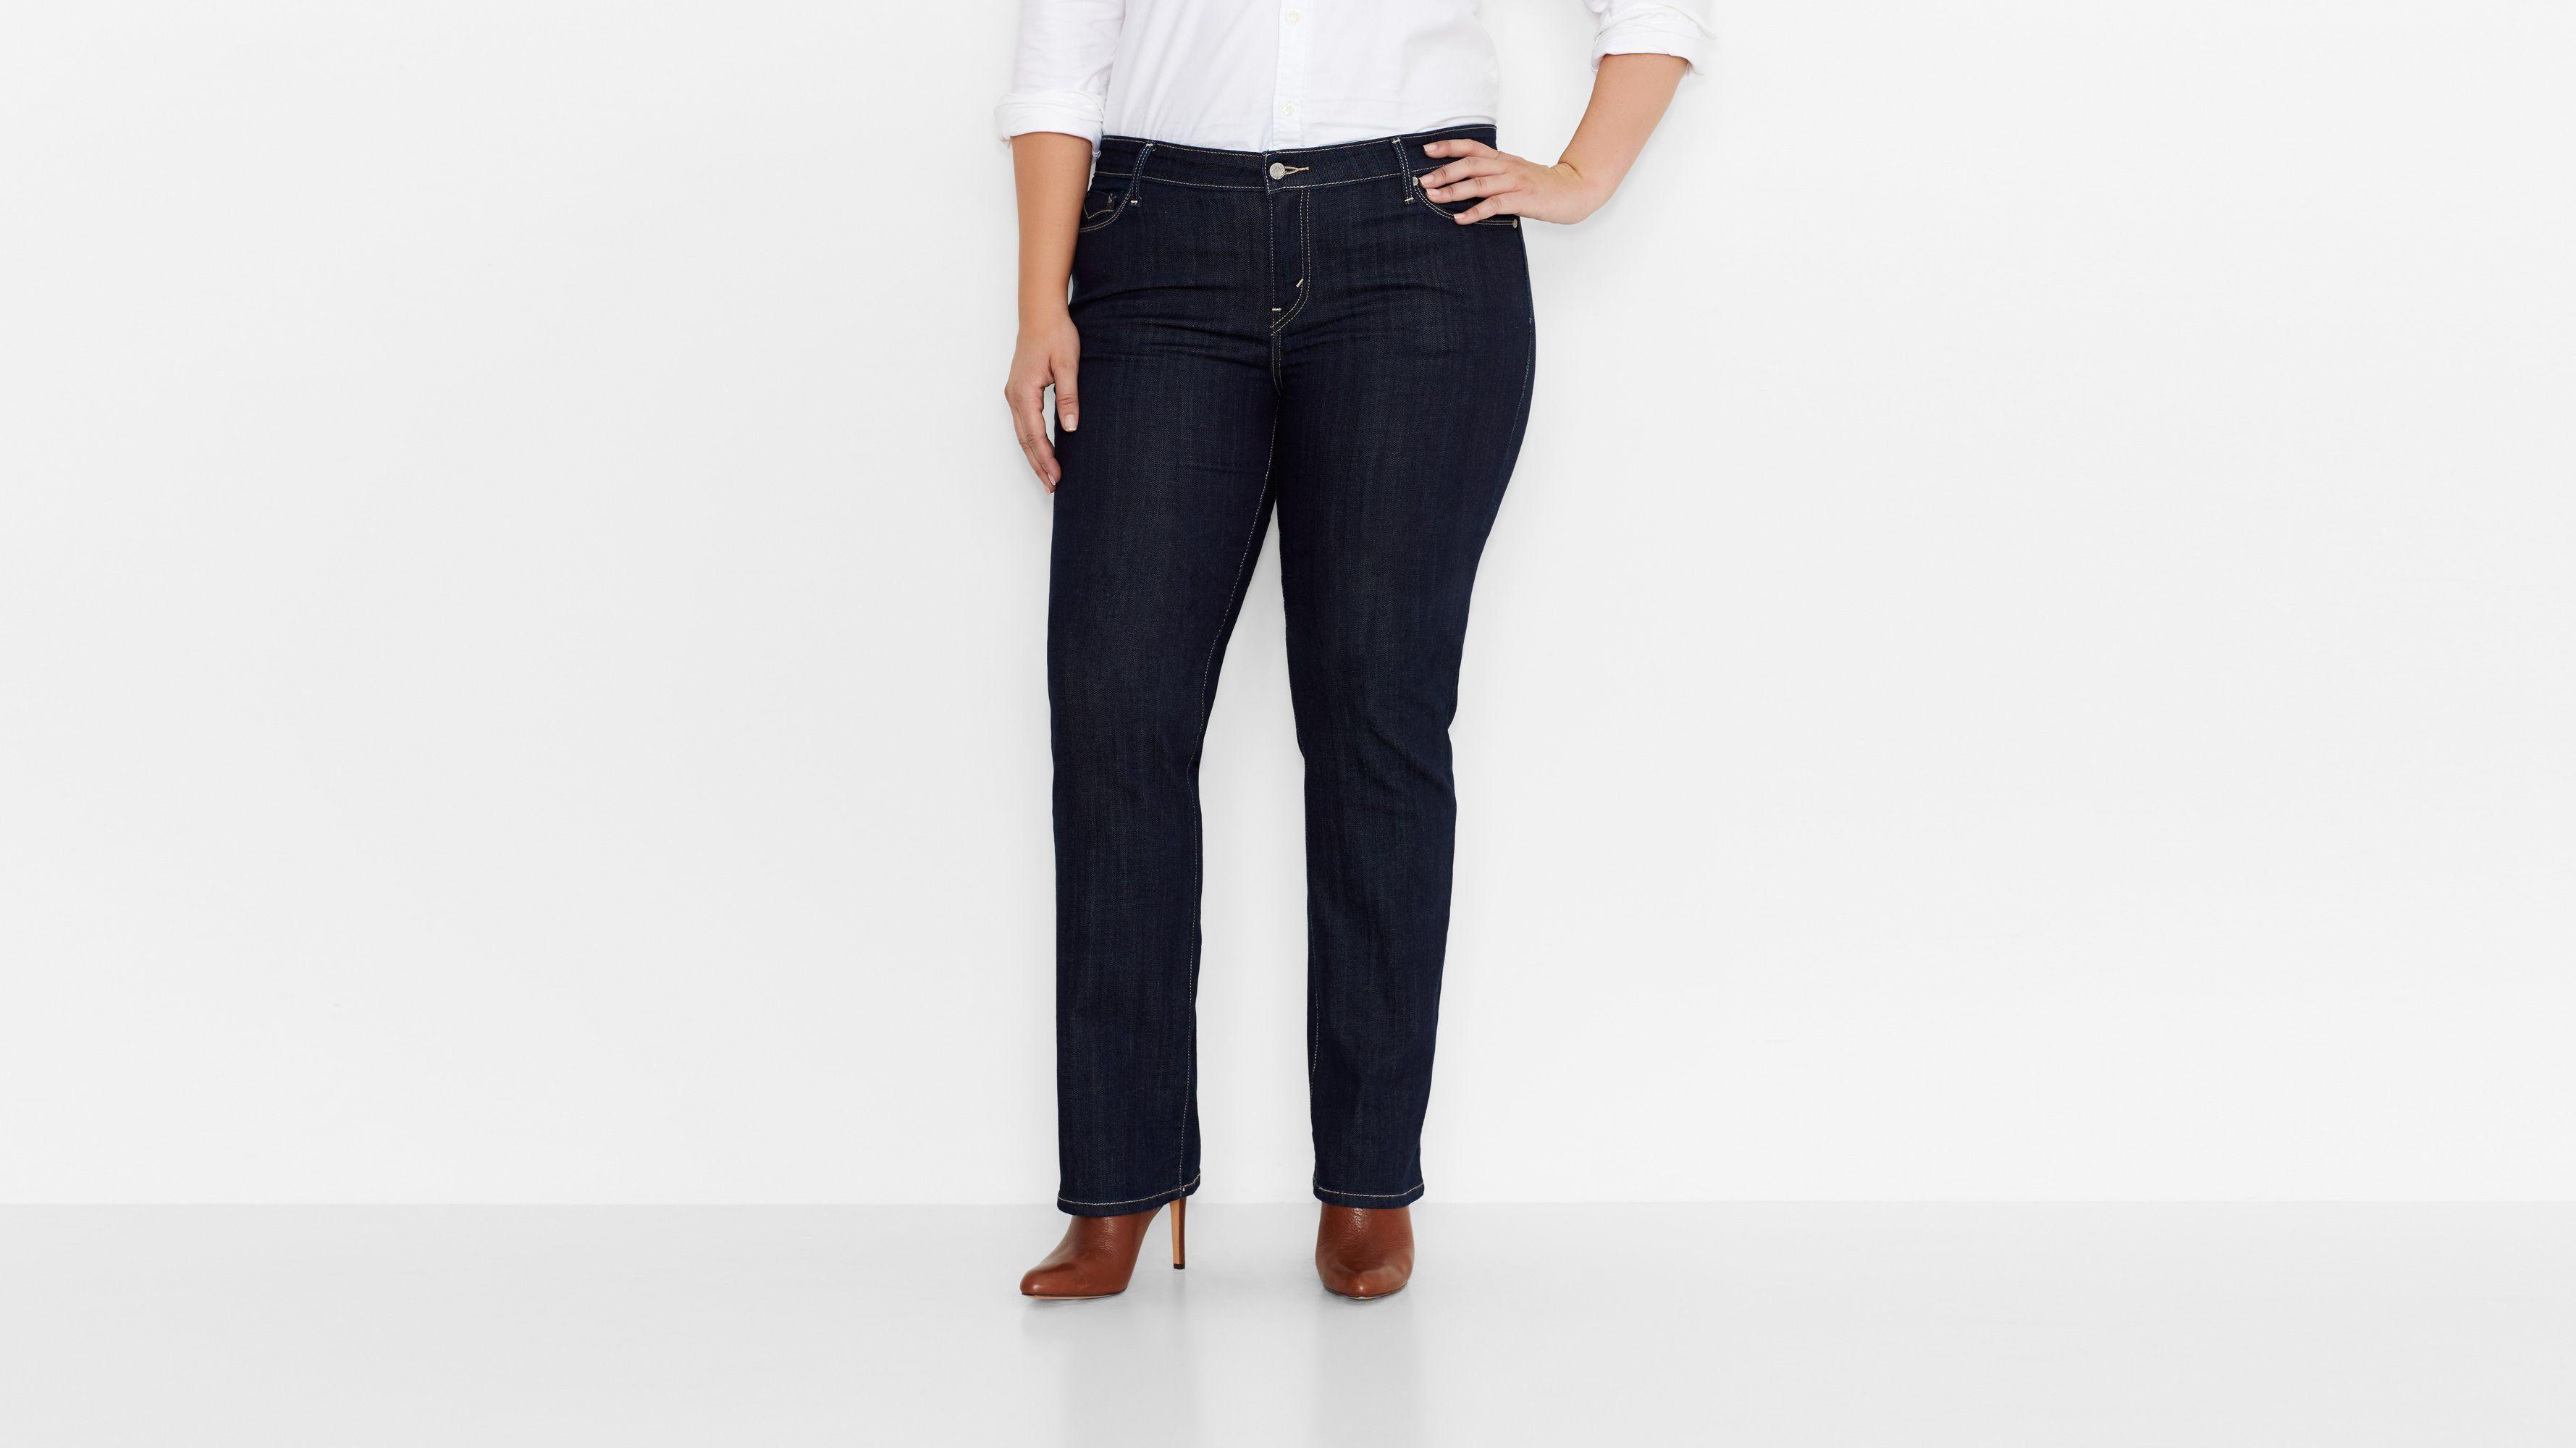 590™ Fuller Waist Straight Jeans (Plus) - Right On Blue